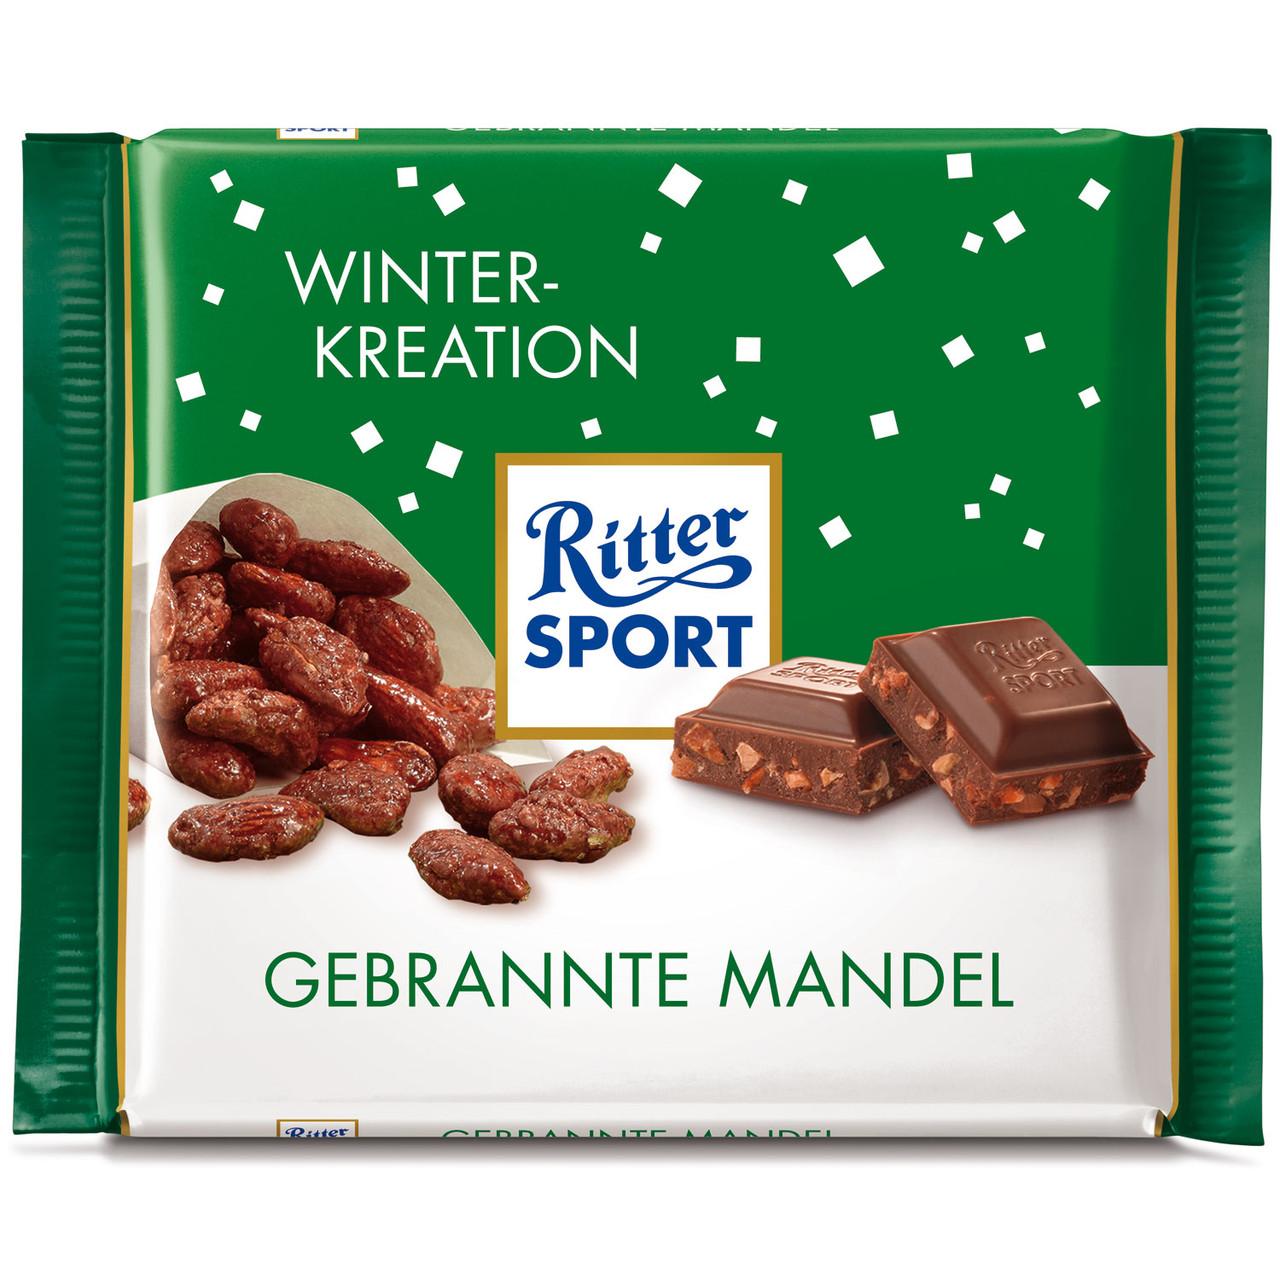 Шоколад Ritter Sport Gebrannte Mandel (Риттер Спорт миндаль в карамели), 100 г